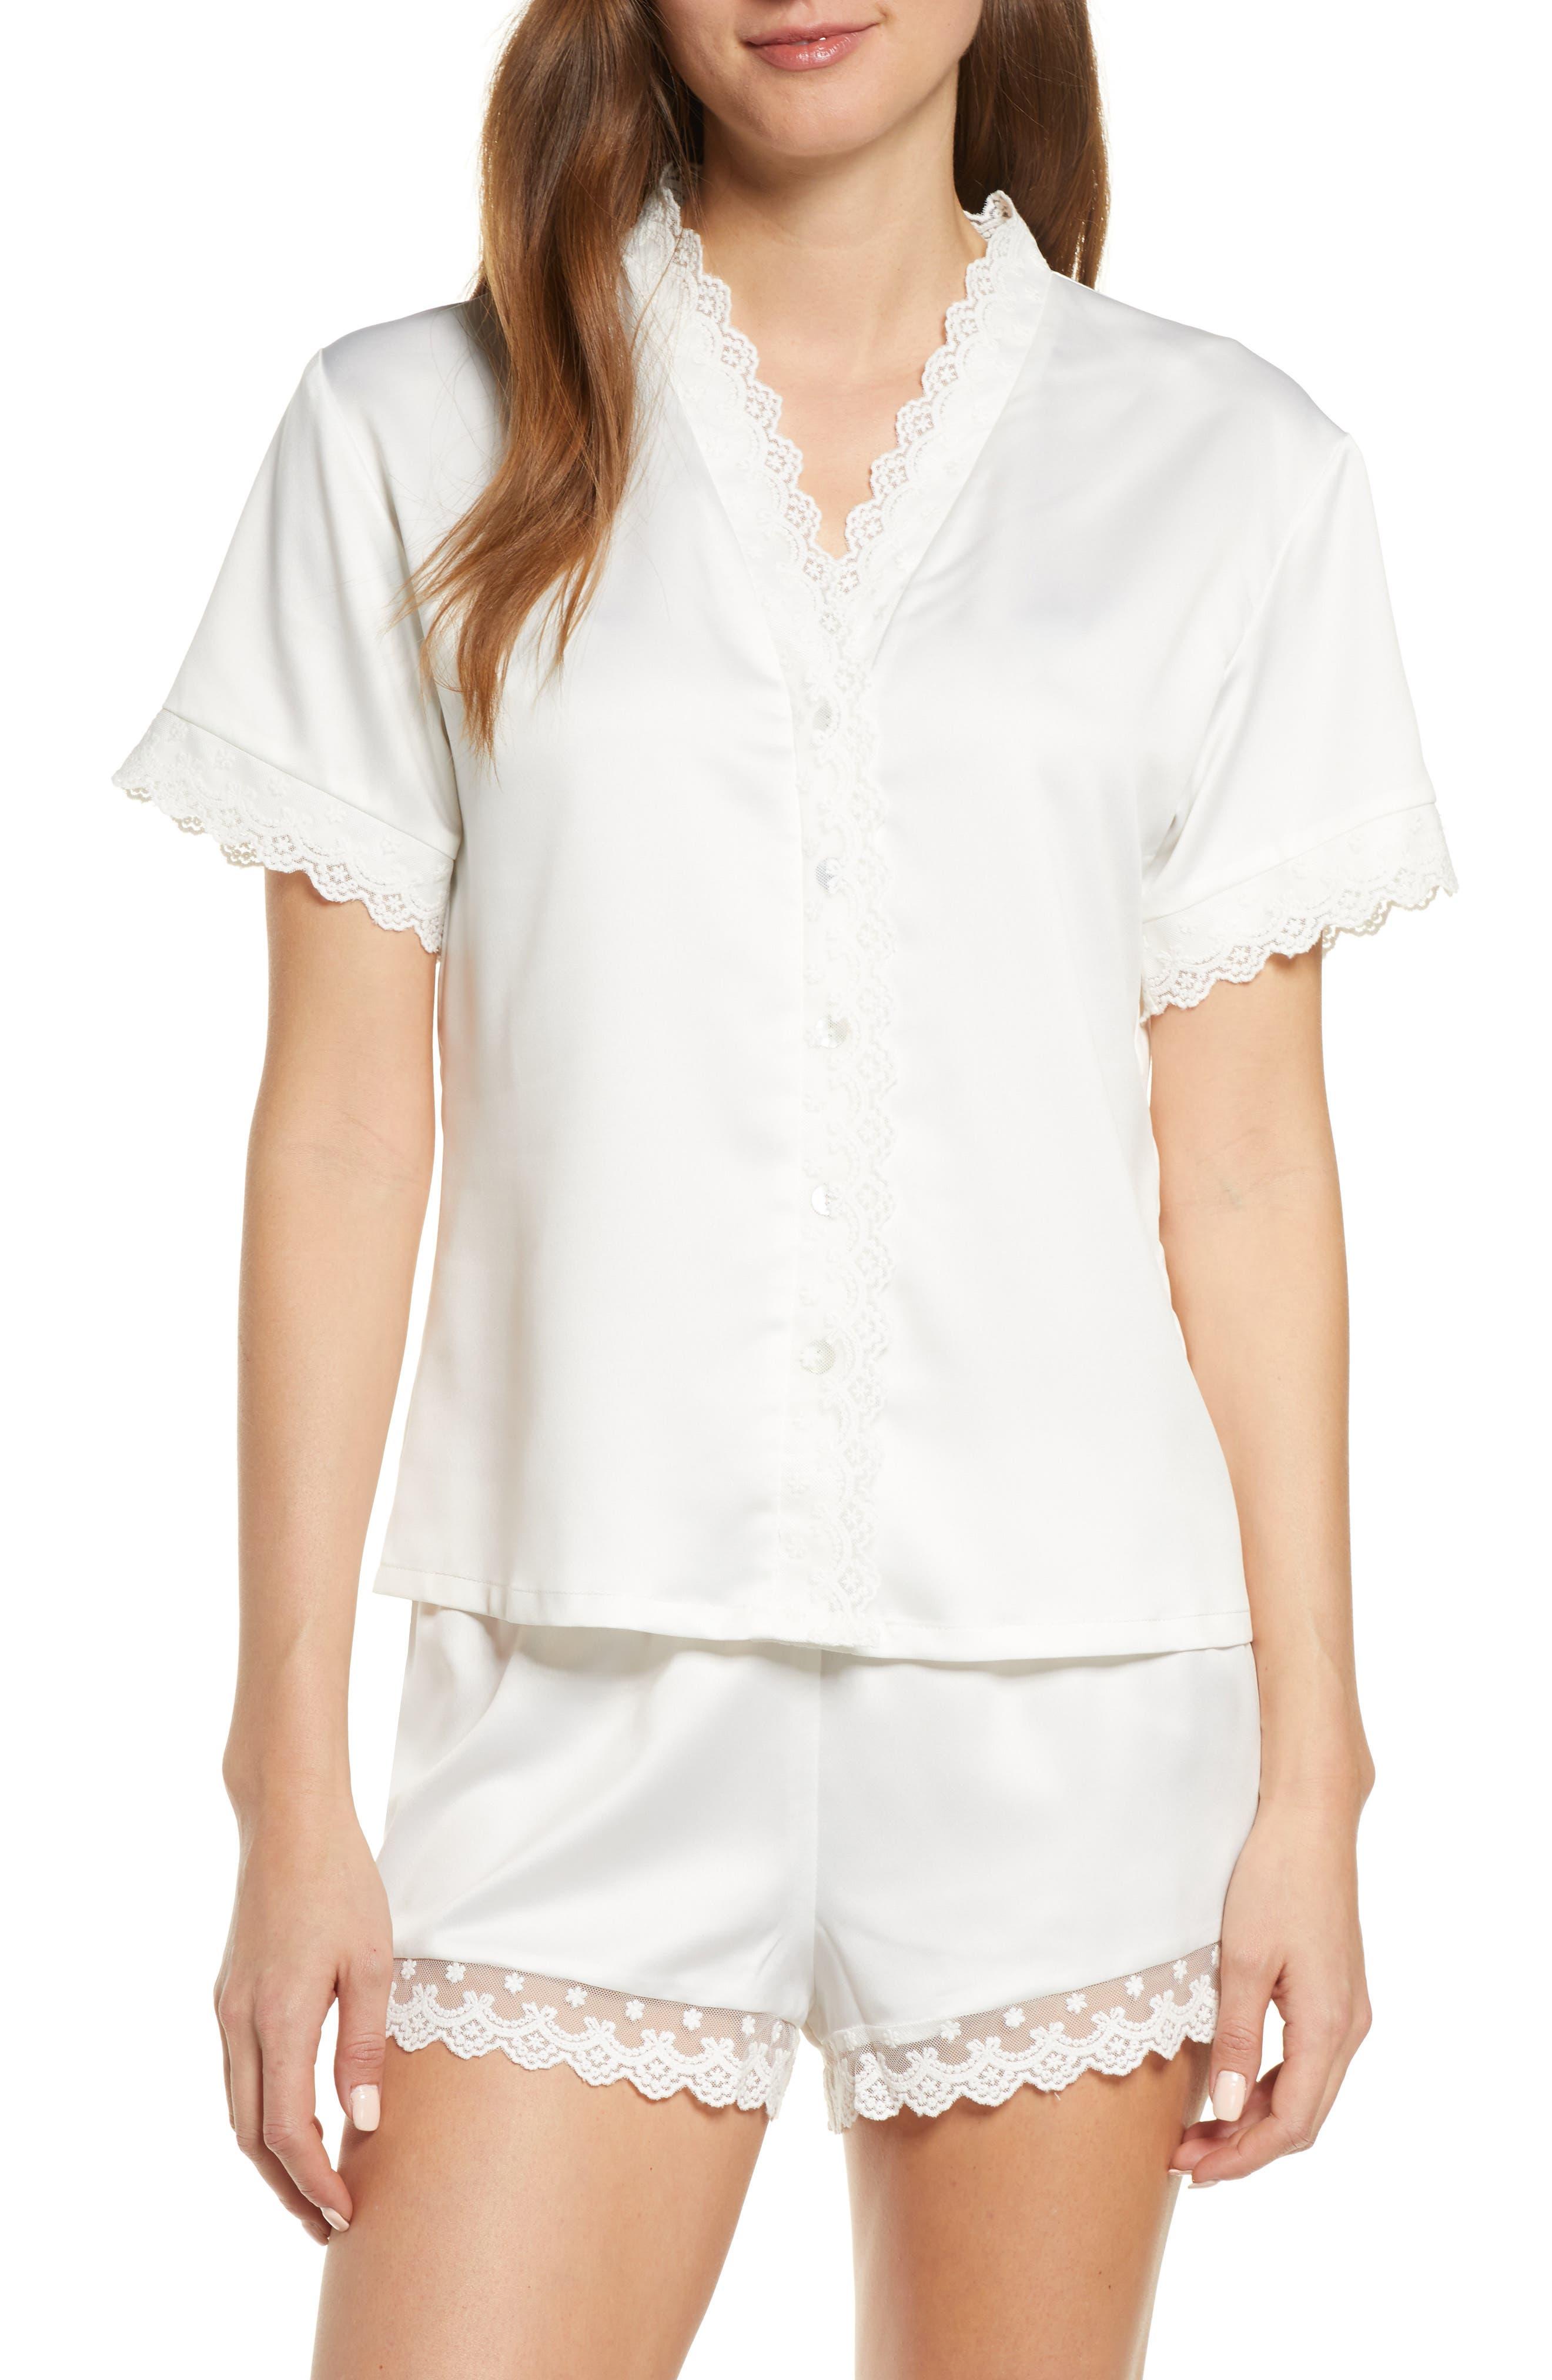 1940s Sleepwear: Nightgowns, Pajamas, Robes, Bed Jackets Womens Flora Nikrooz Victoria Short Satin Pajamas $57.00 AT vintagedancer.com